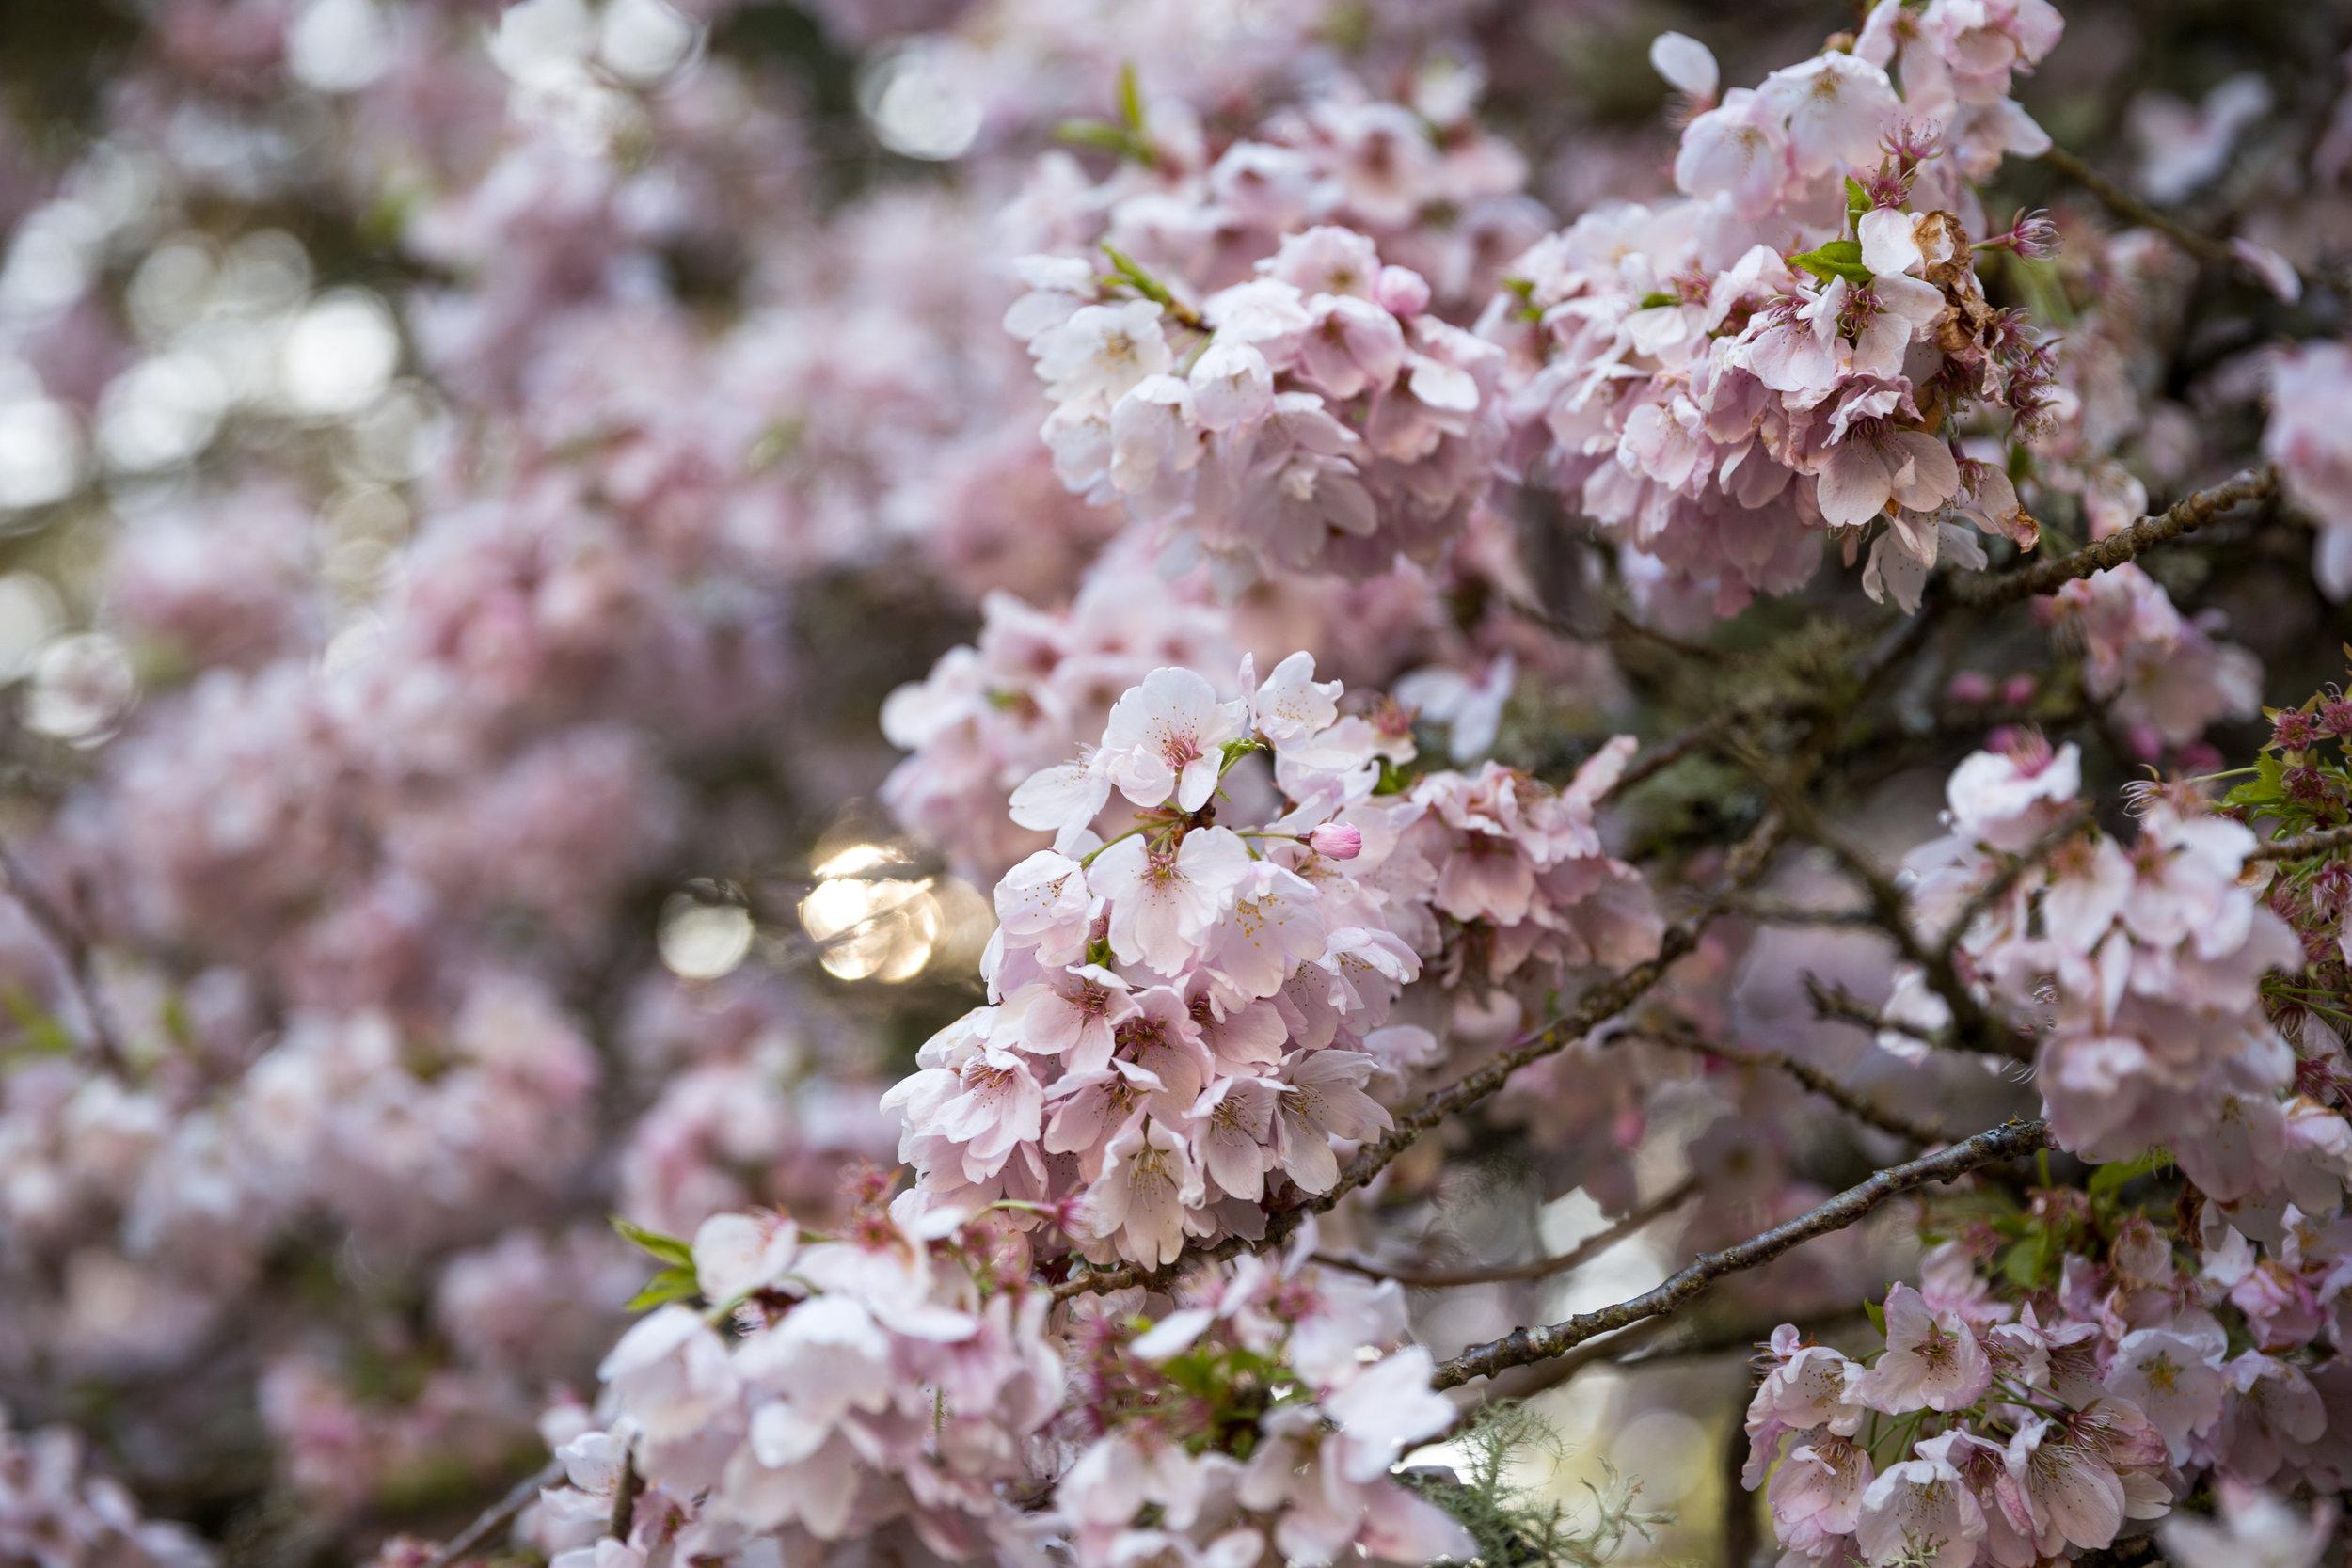 4 april 12th 2018 point defiance flowers flowering trees 5 stars-91.jpg